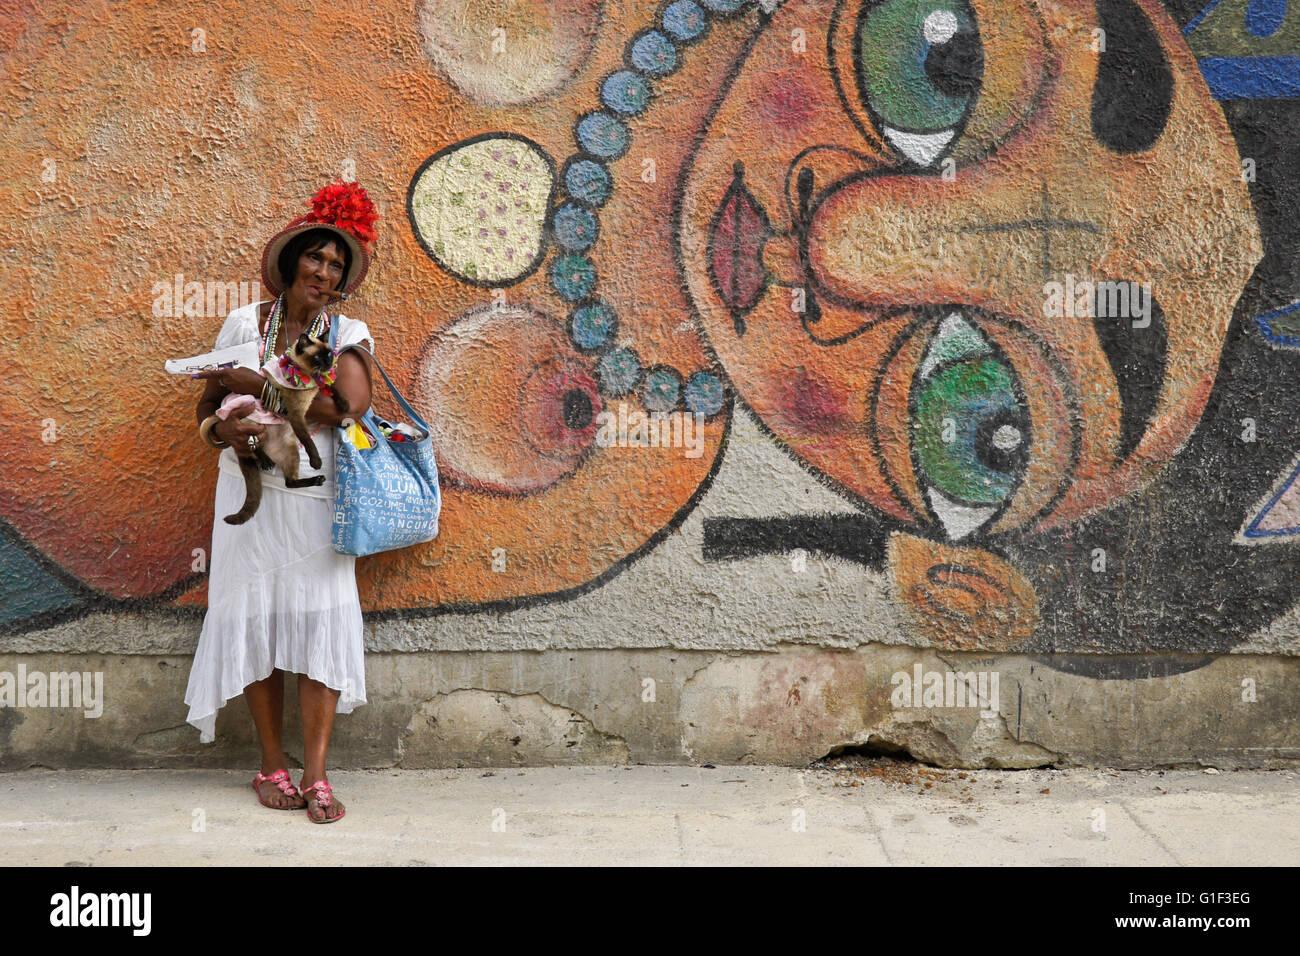 Cigar-smoking woman and her cat in front of street mural, Havana, Cuba - Stock Image